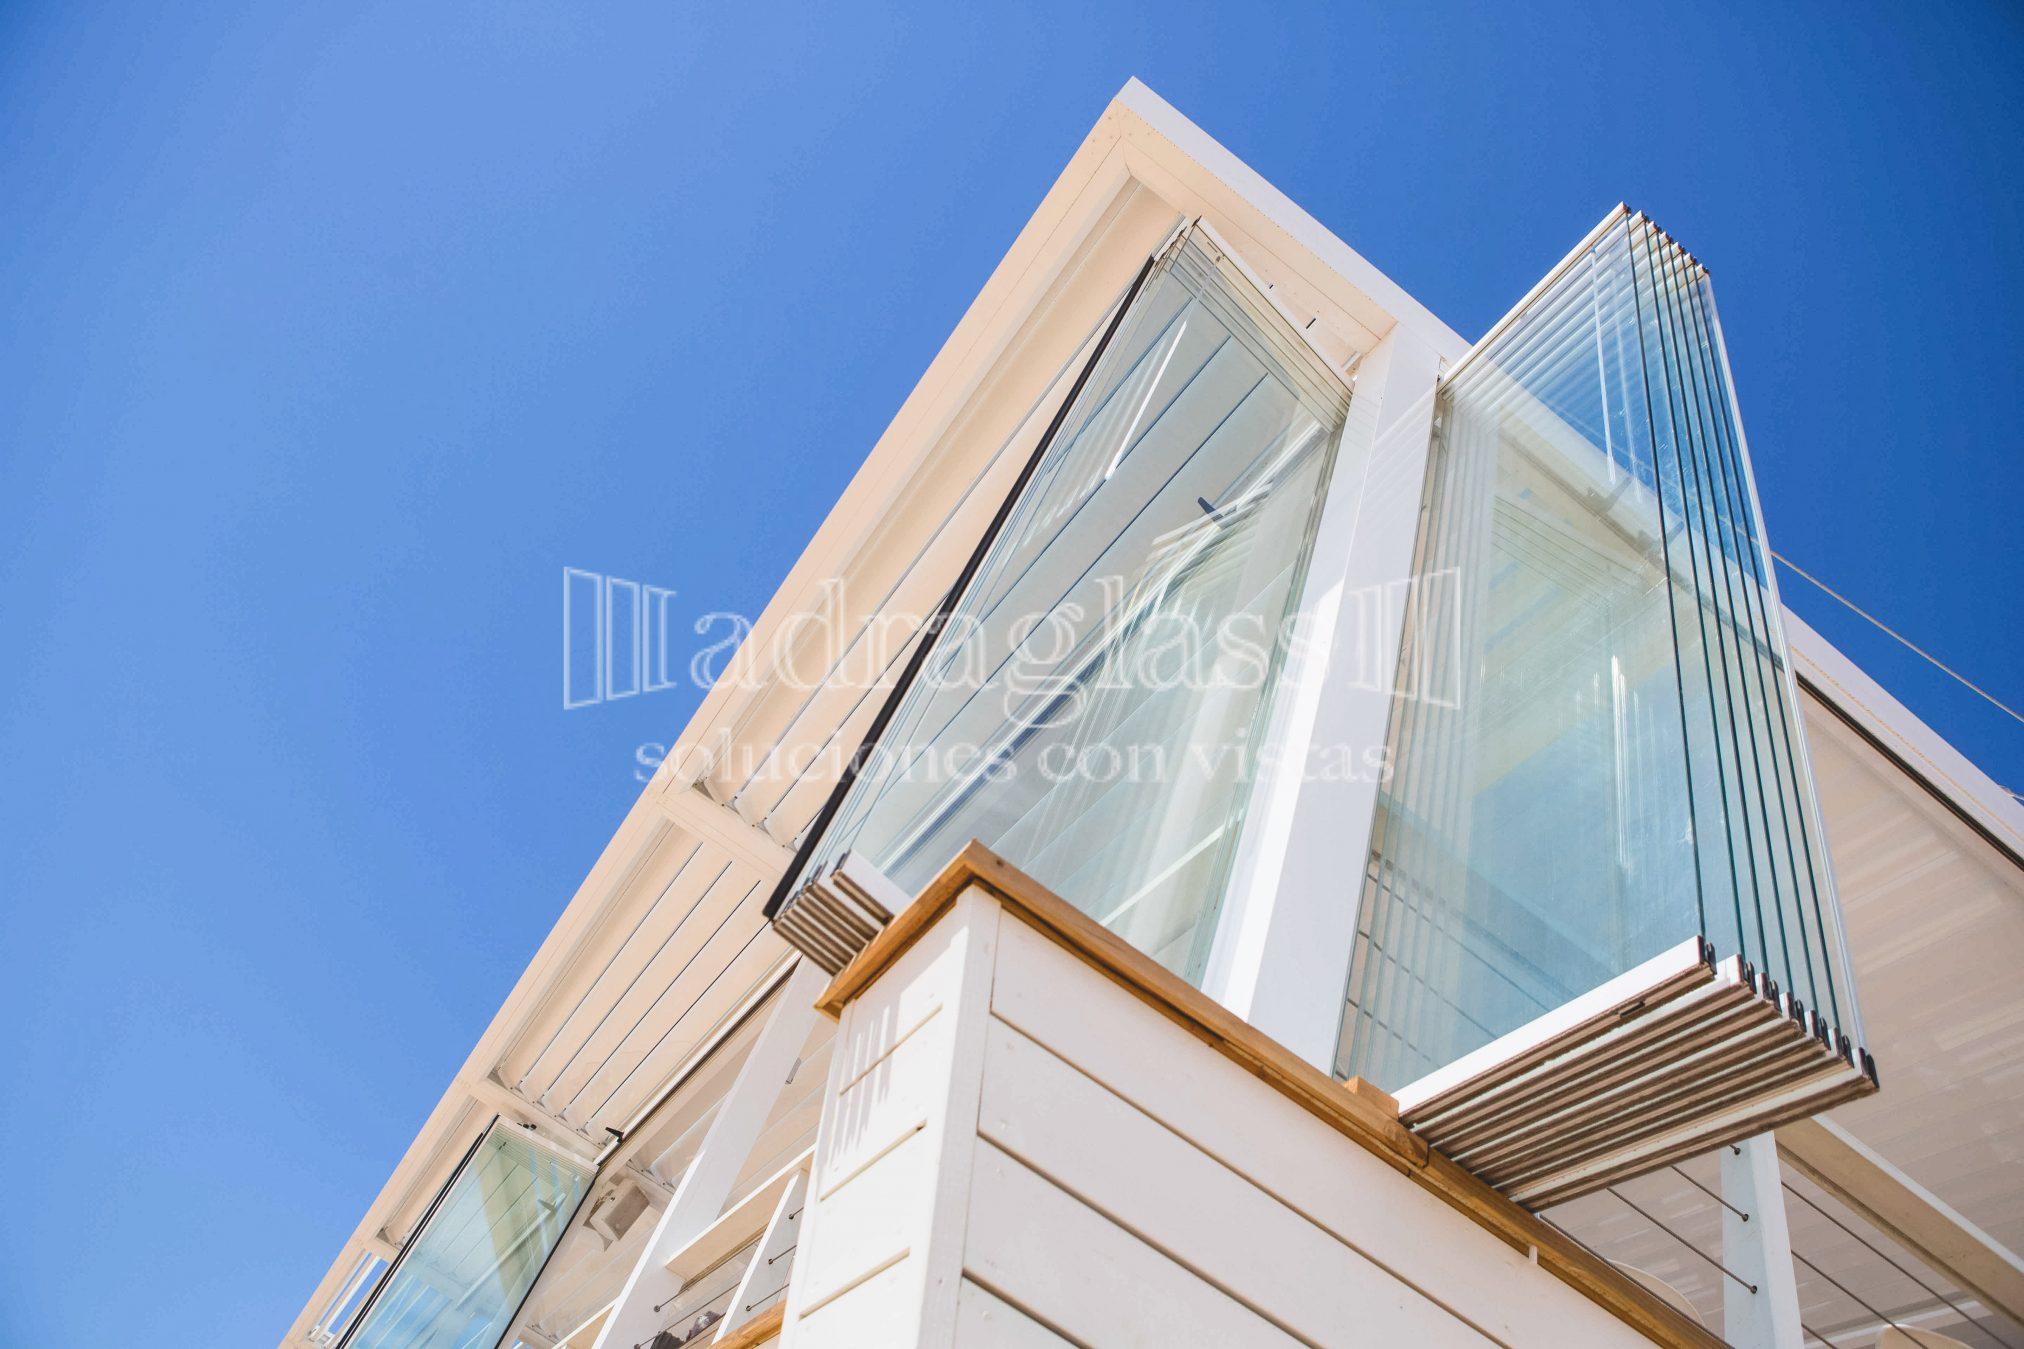 Adraglass cortinas de cristal para terrazas panor micas for Cortina cristal terraza